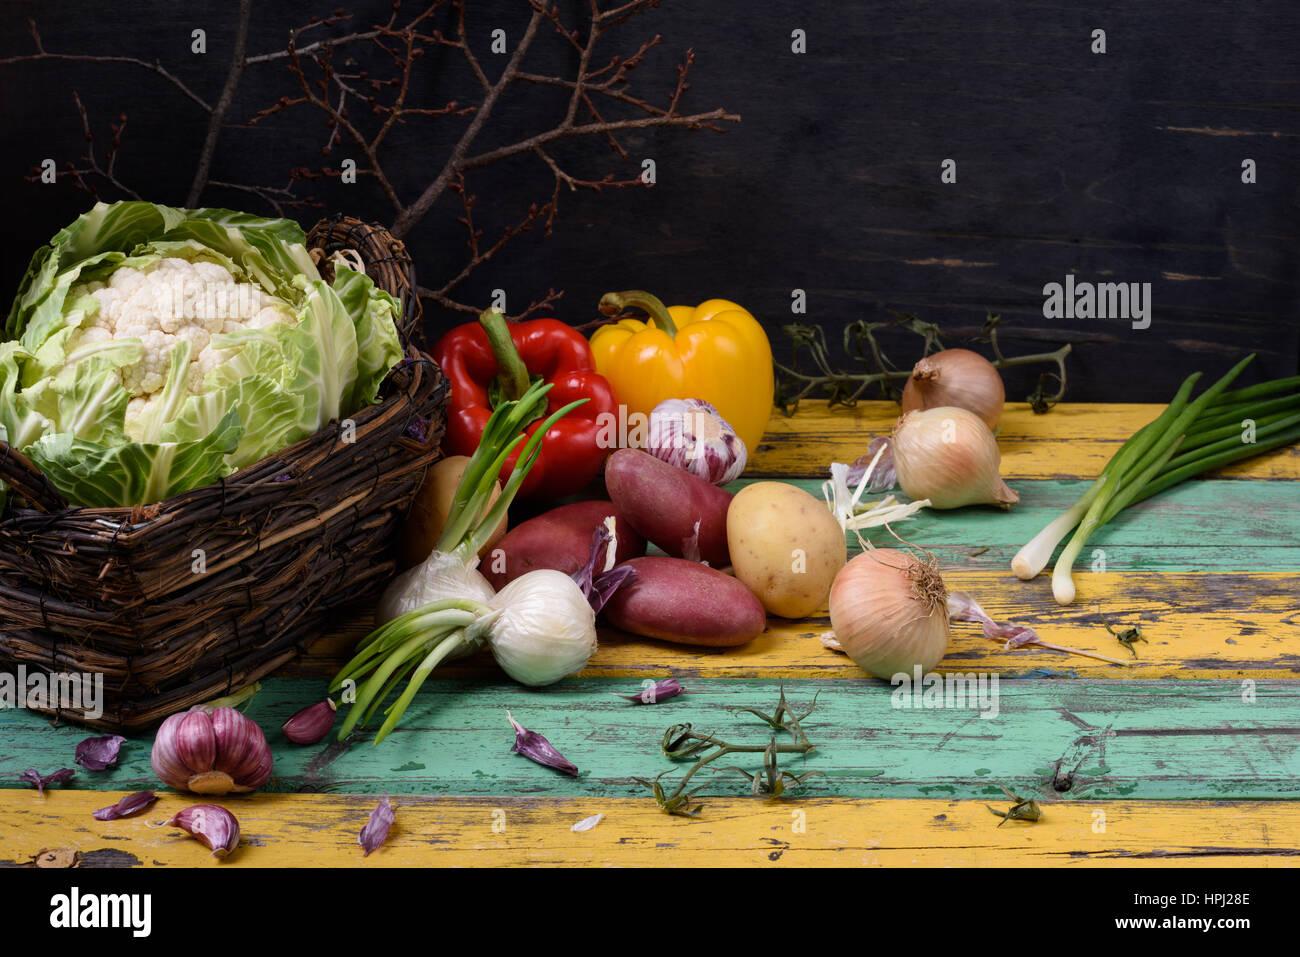 Organic seasonal vegetable ingredients over colorful wooden table. Healthy food or vegetarian diet concept. Stock Photo